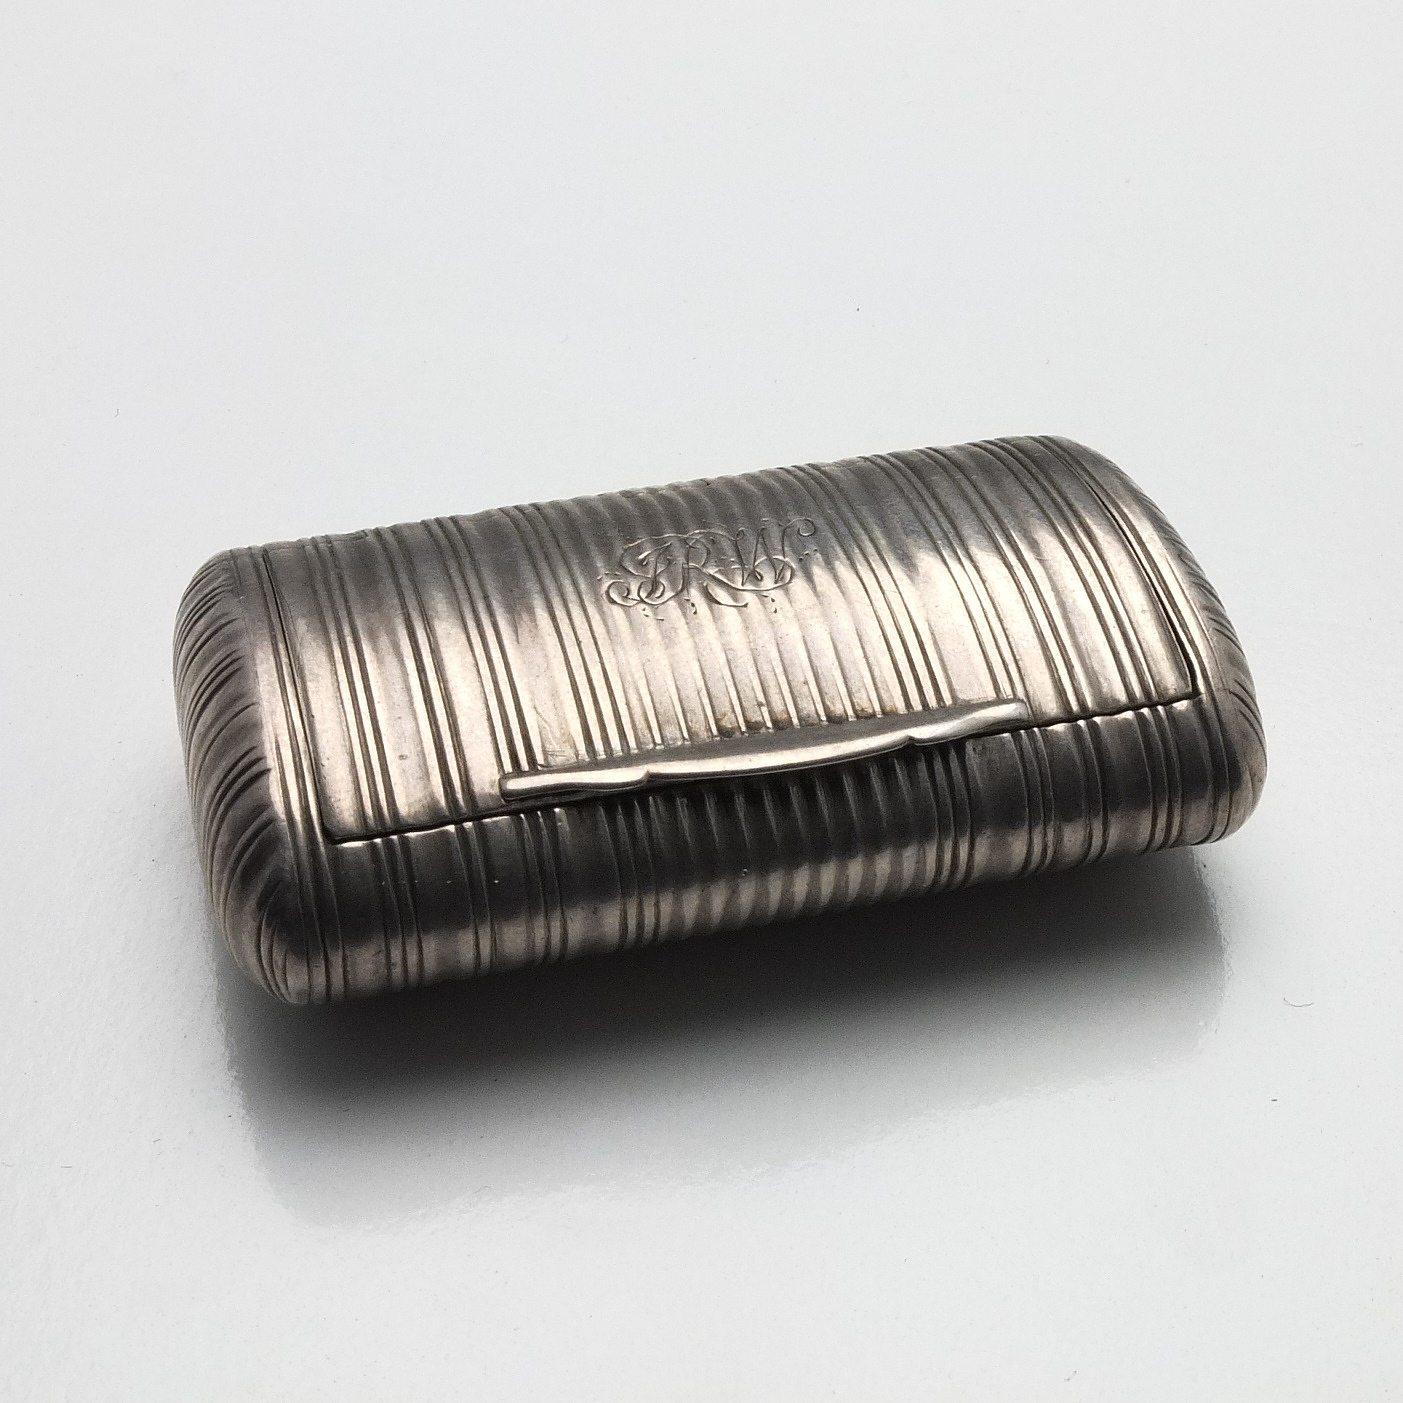 'George III Monogrammed Sterling Silver Snuff Box John Shaw Birmingham 1812'